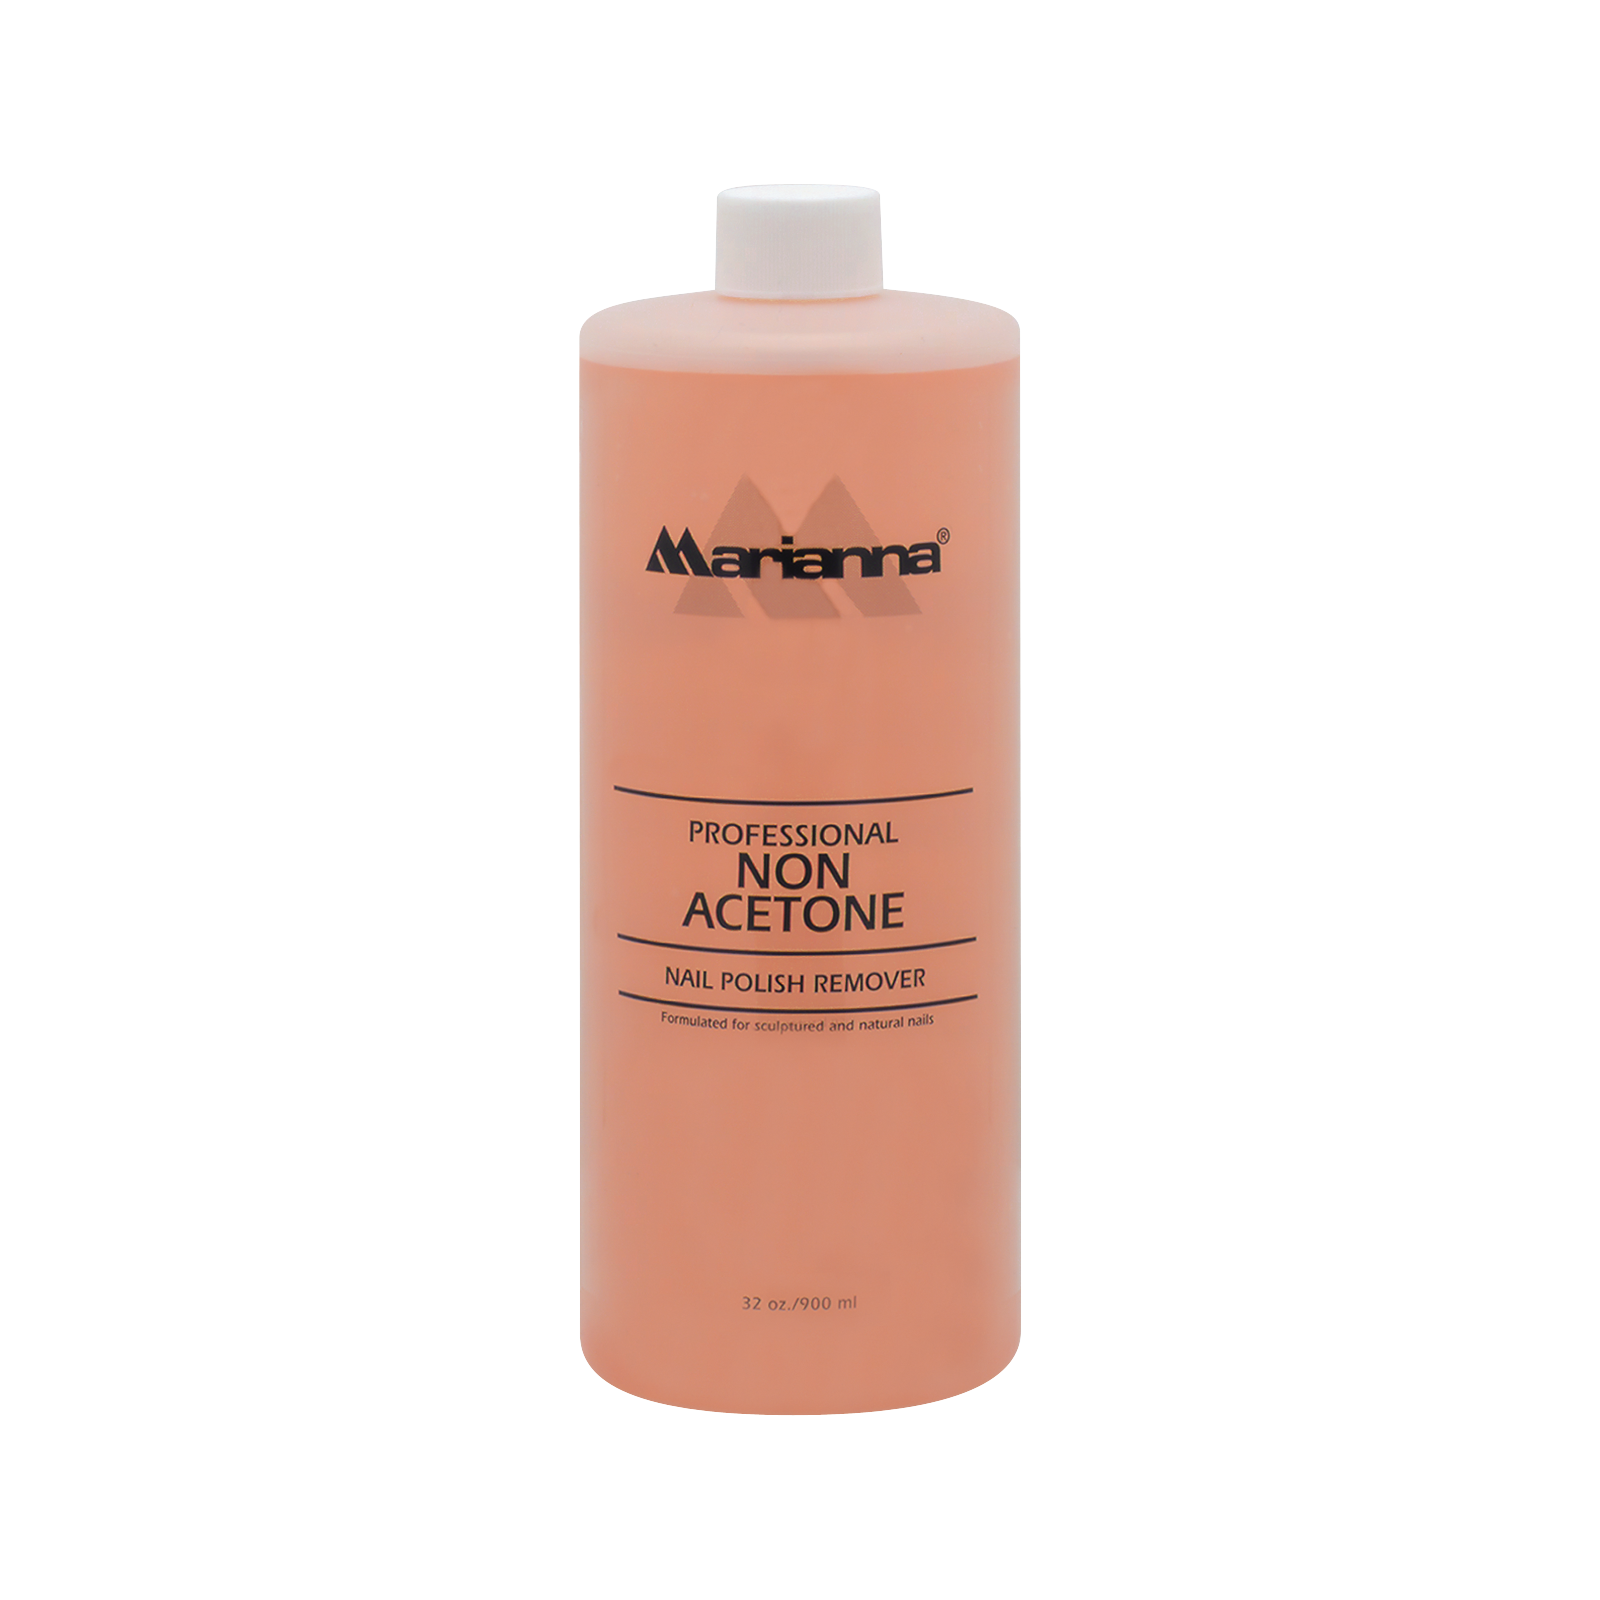 Non-Acetone Nail Polish Remover - Marianna | CosmoProf